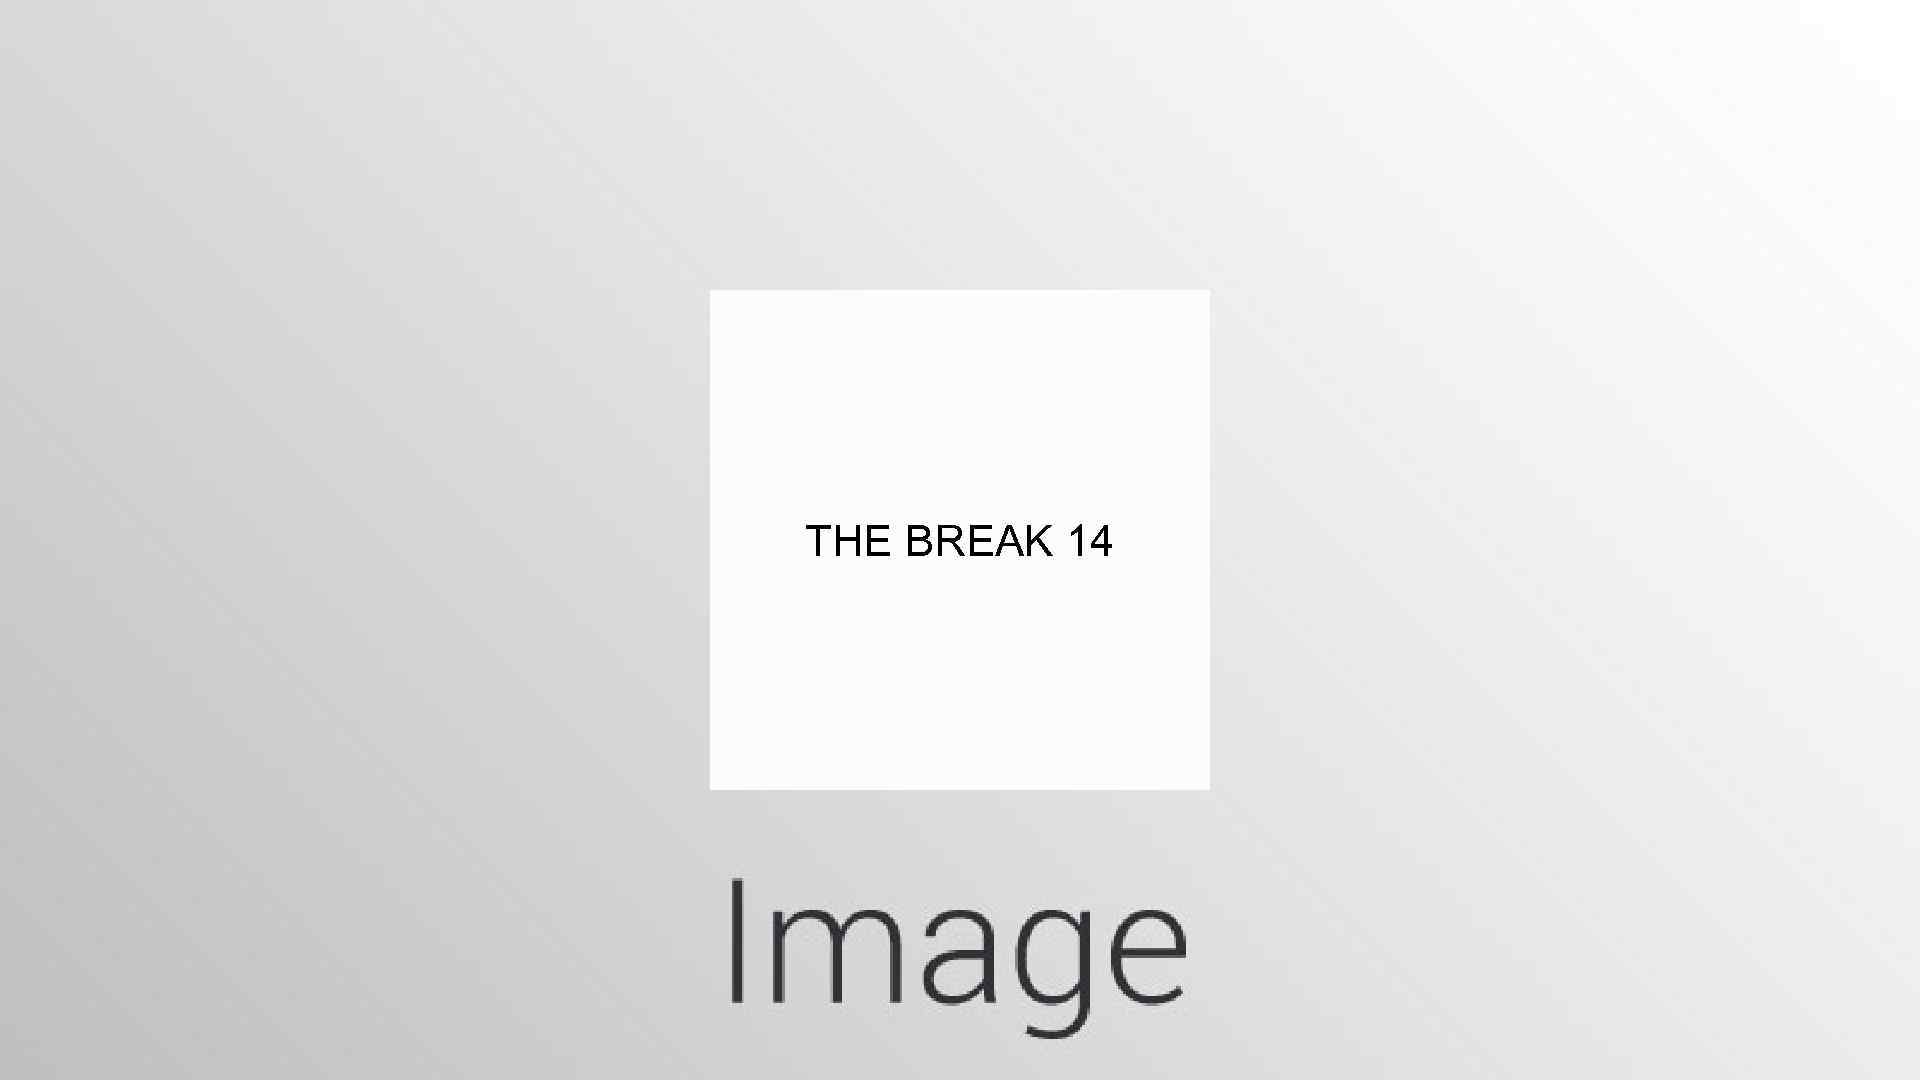 THE BREAK 14